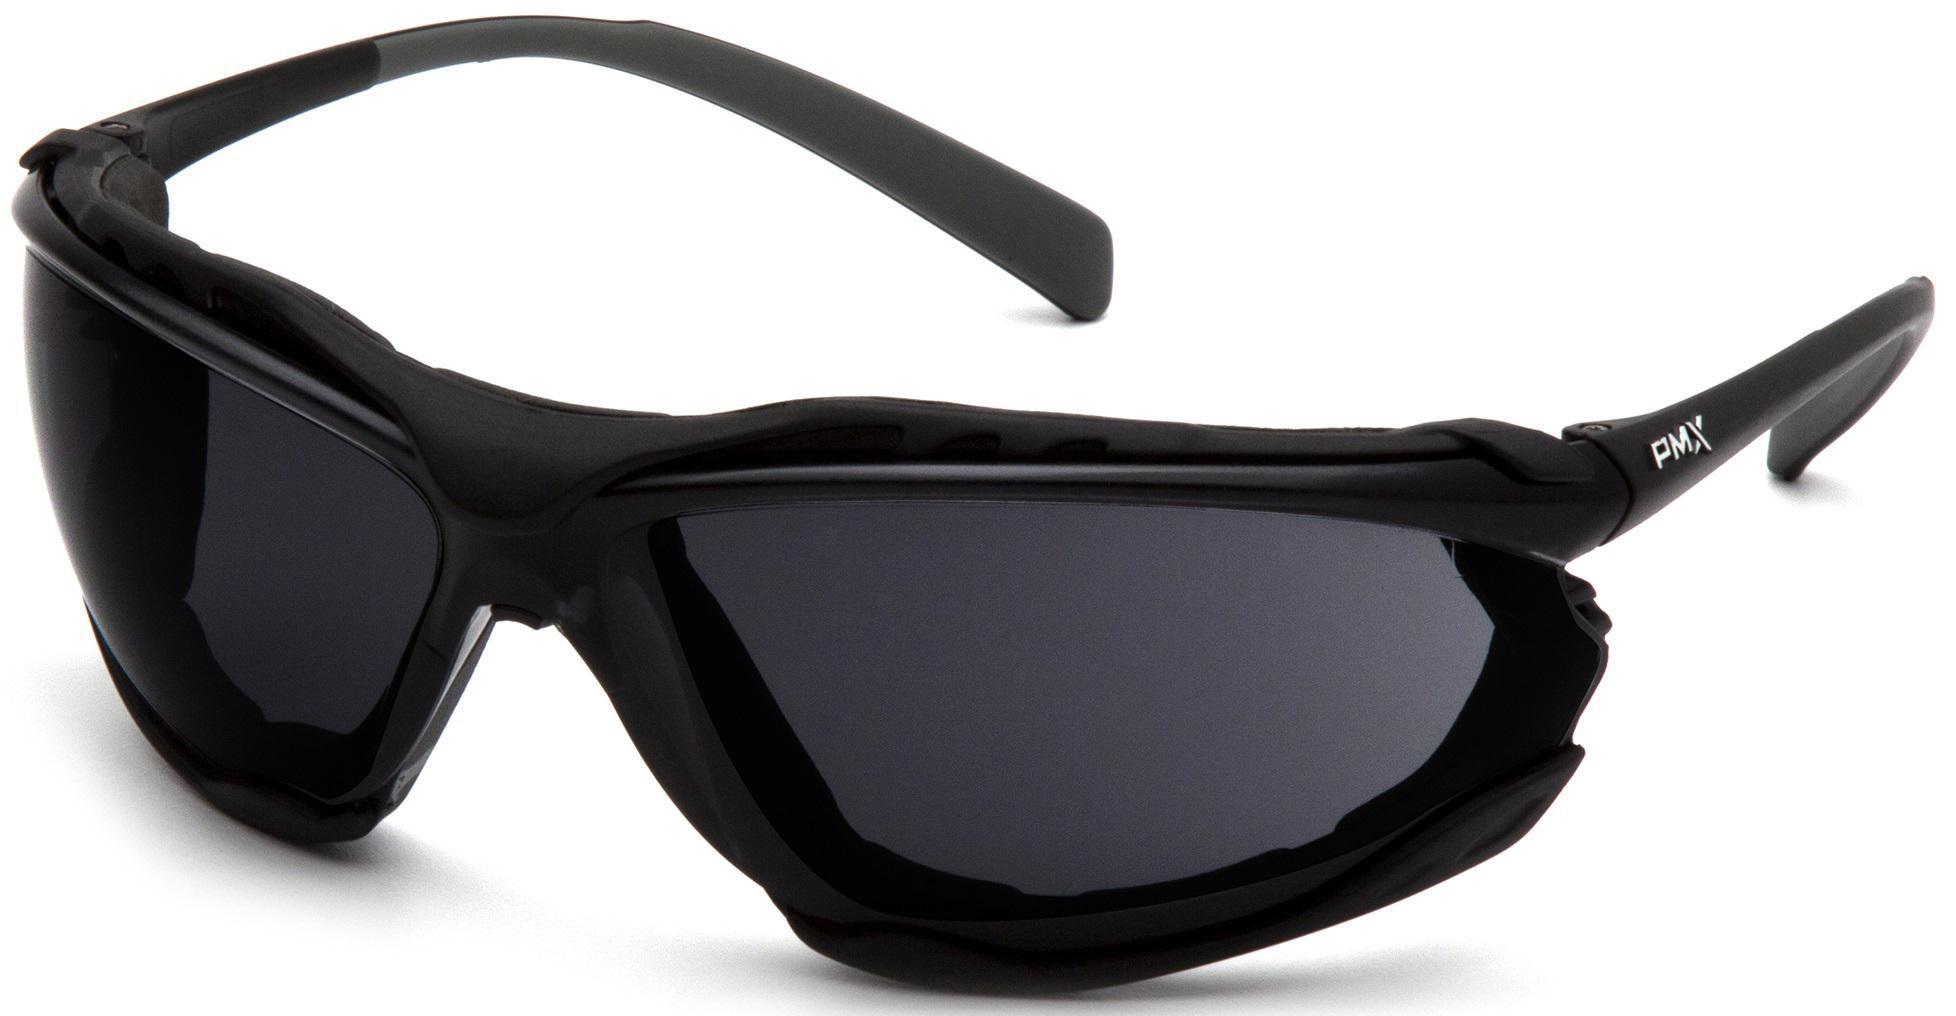 Pyramex Proximity Safety Glasses Eye Protection